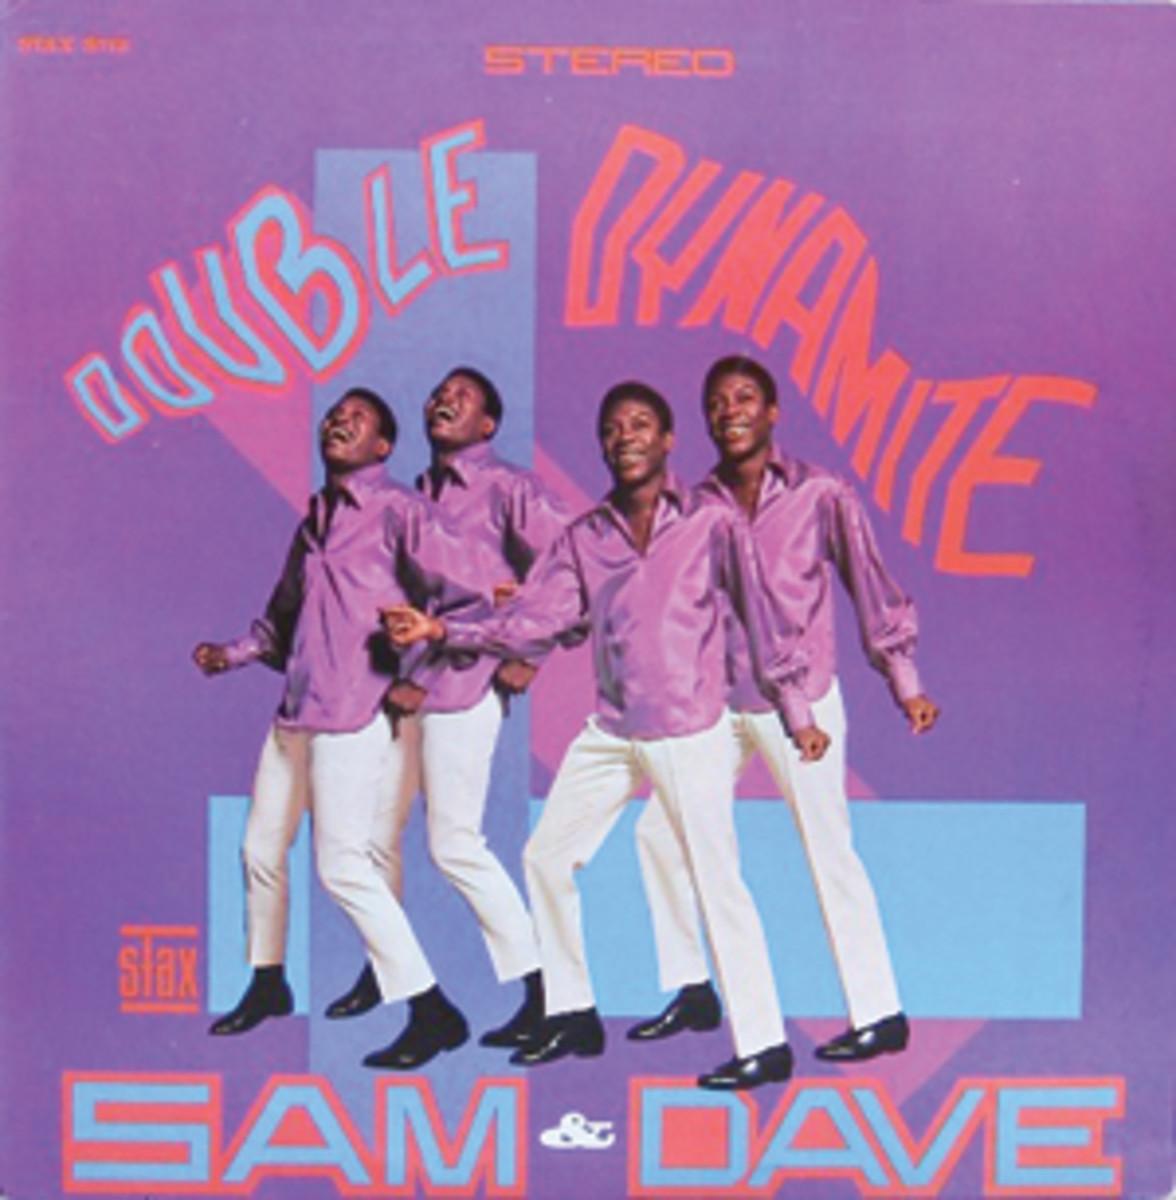 Sam & Dave, Double Dynamite